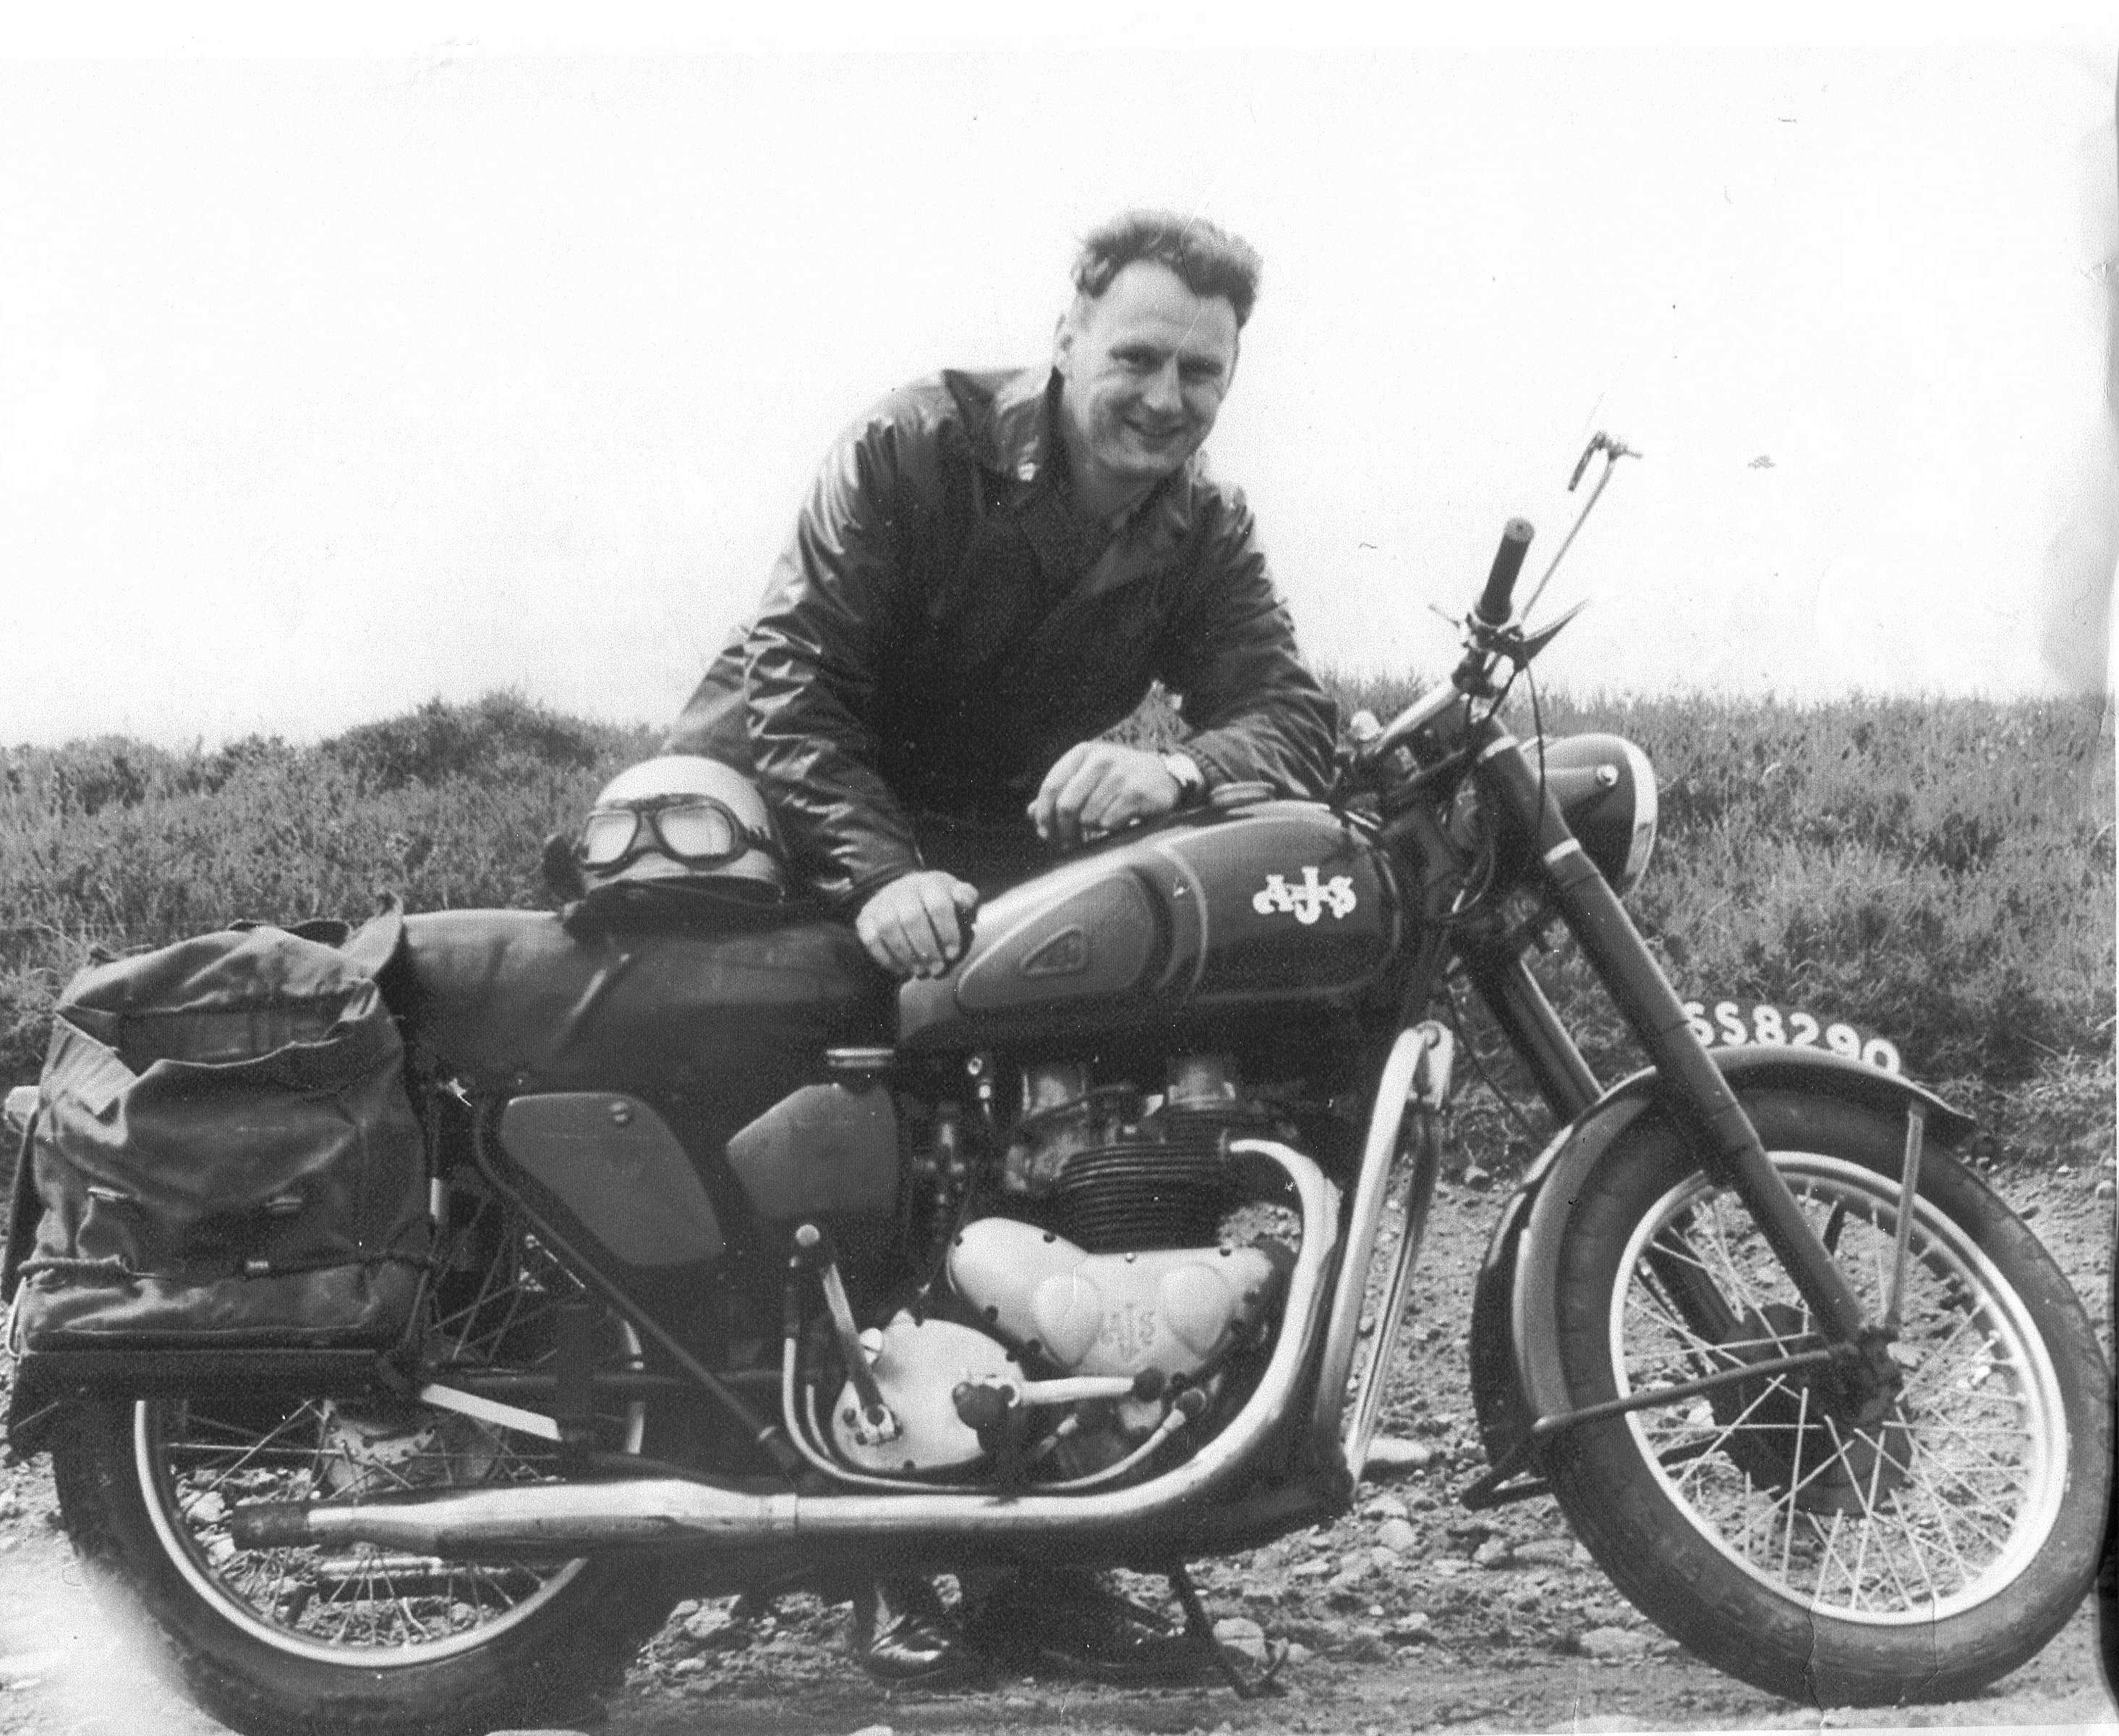 Man With Motorbike 1960s